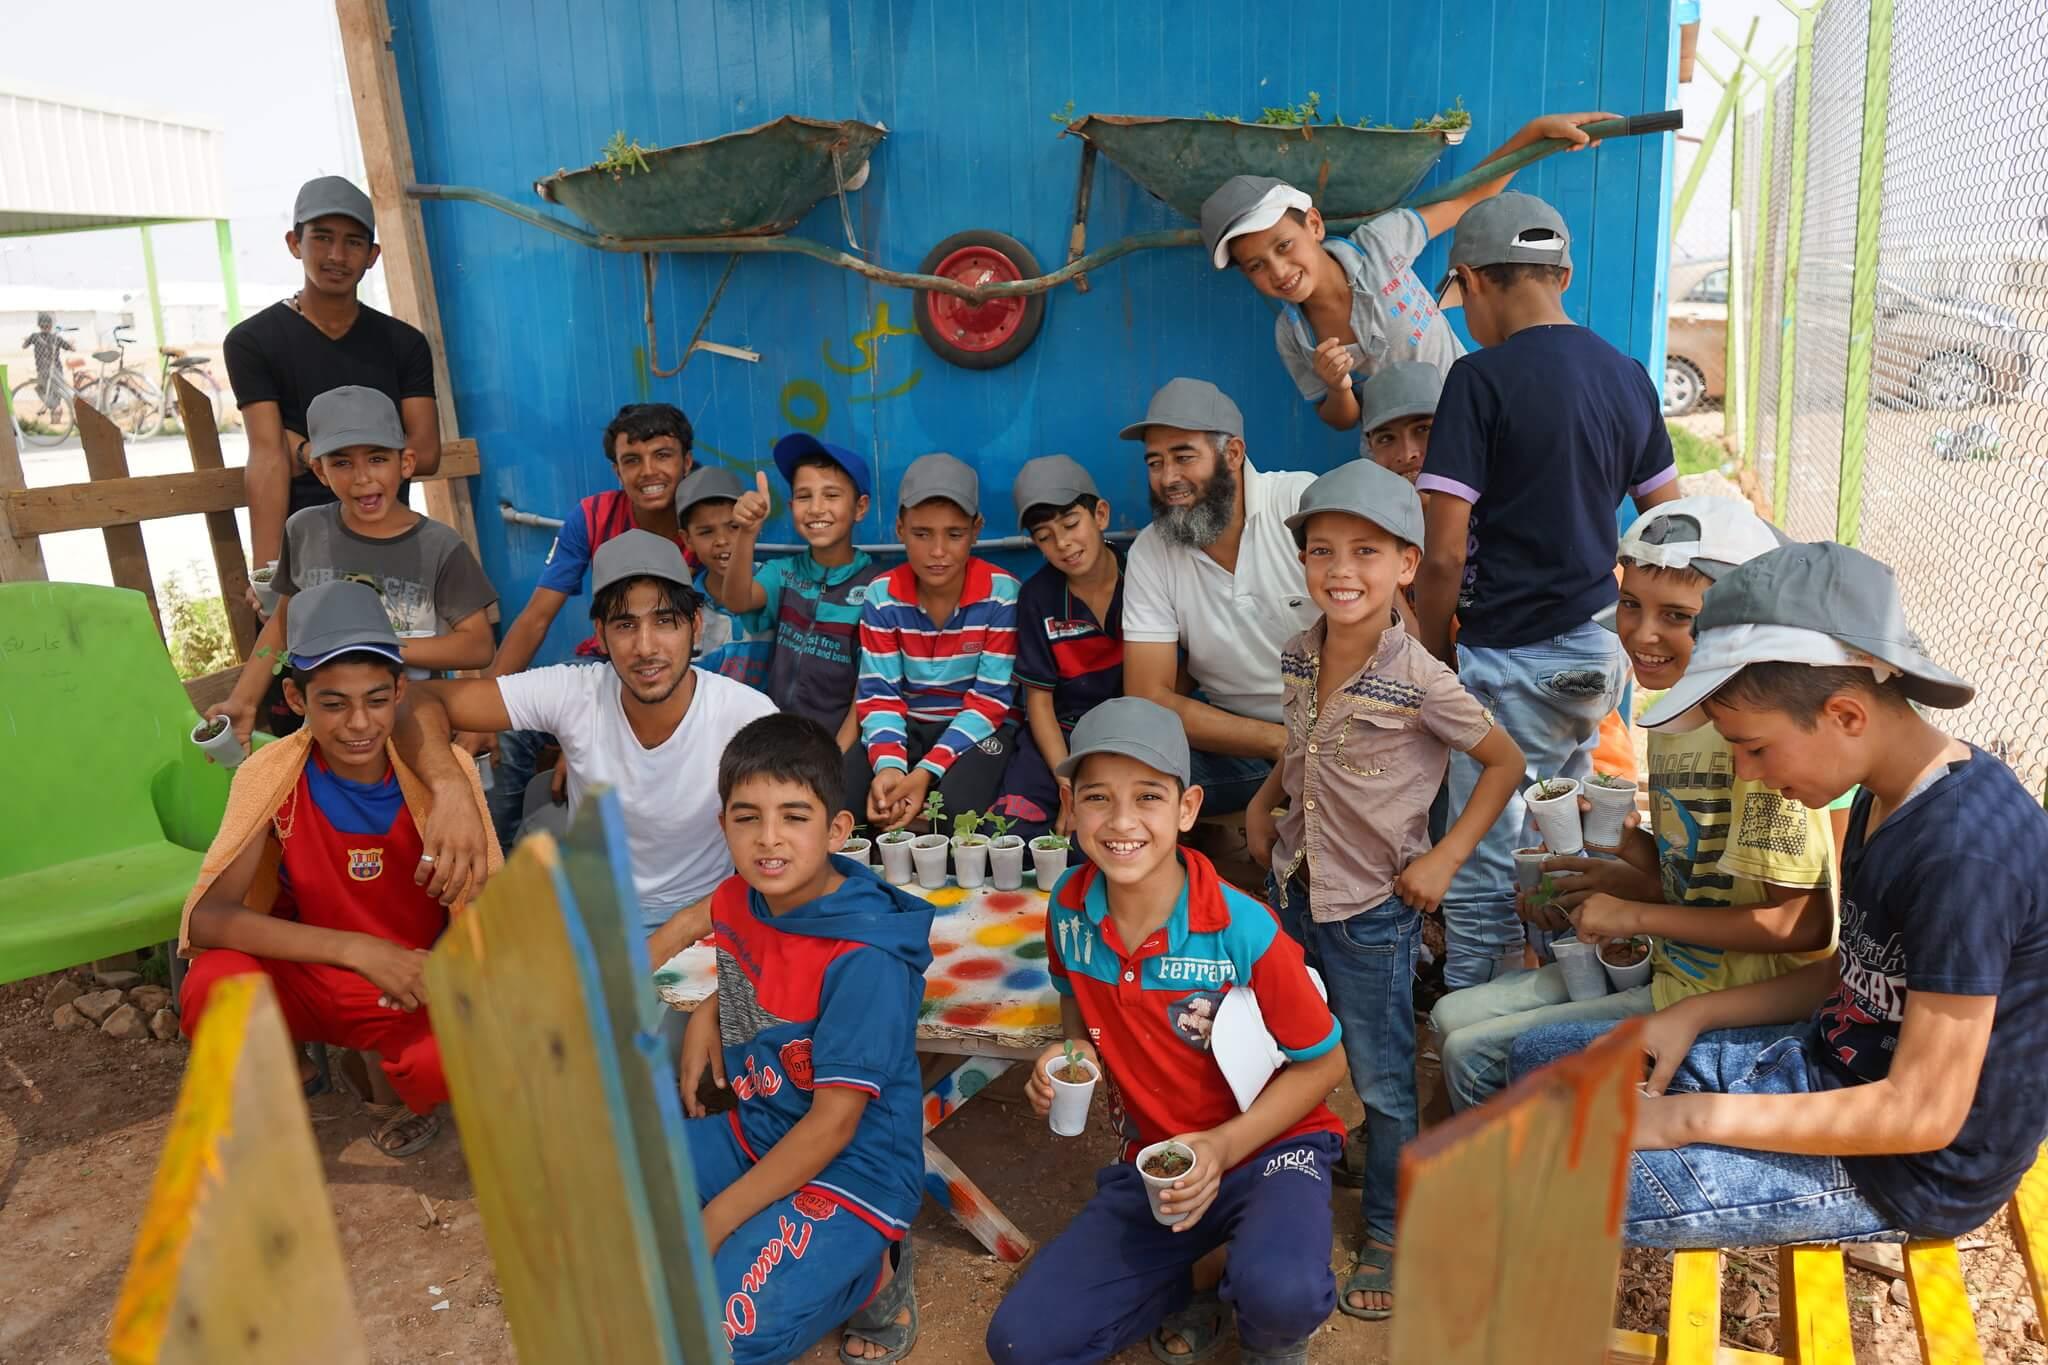 Azraq põllumajandusklass humanitaarabi Jordaania Süüria